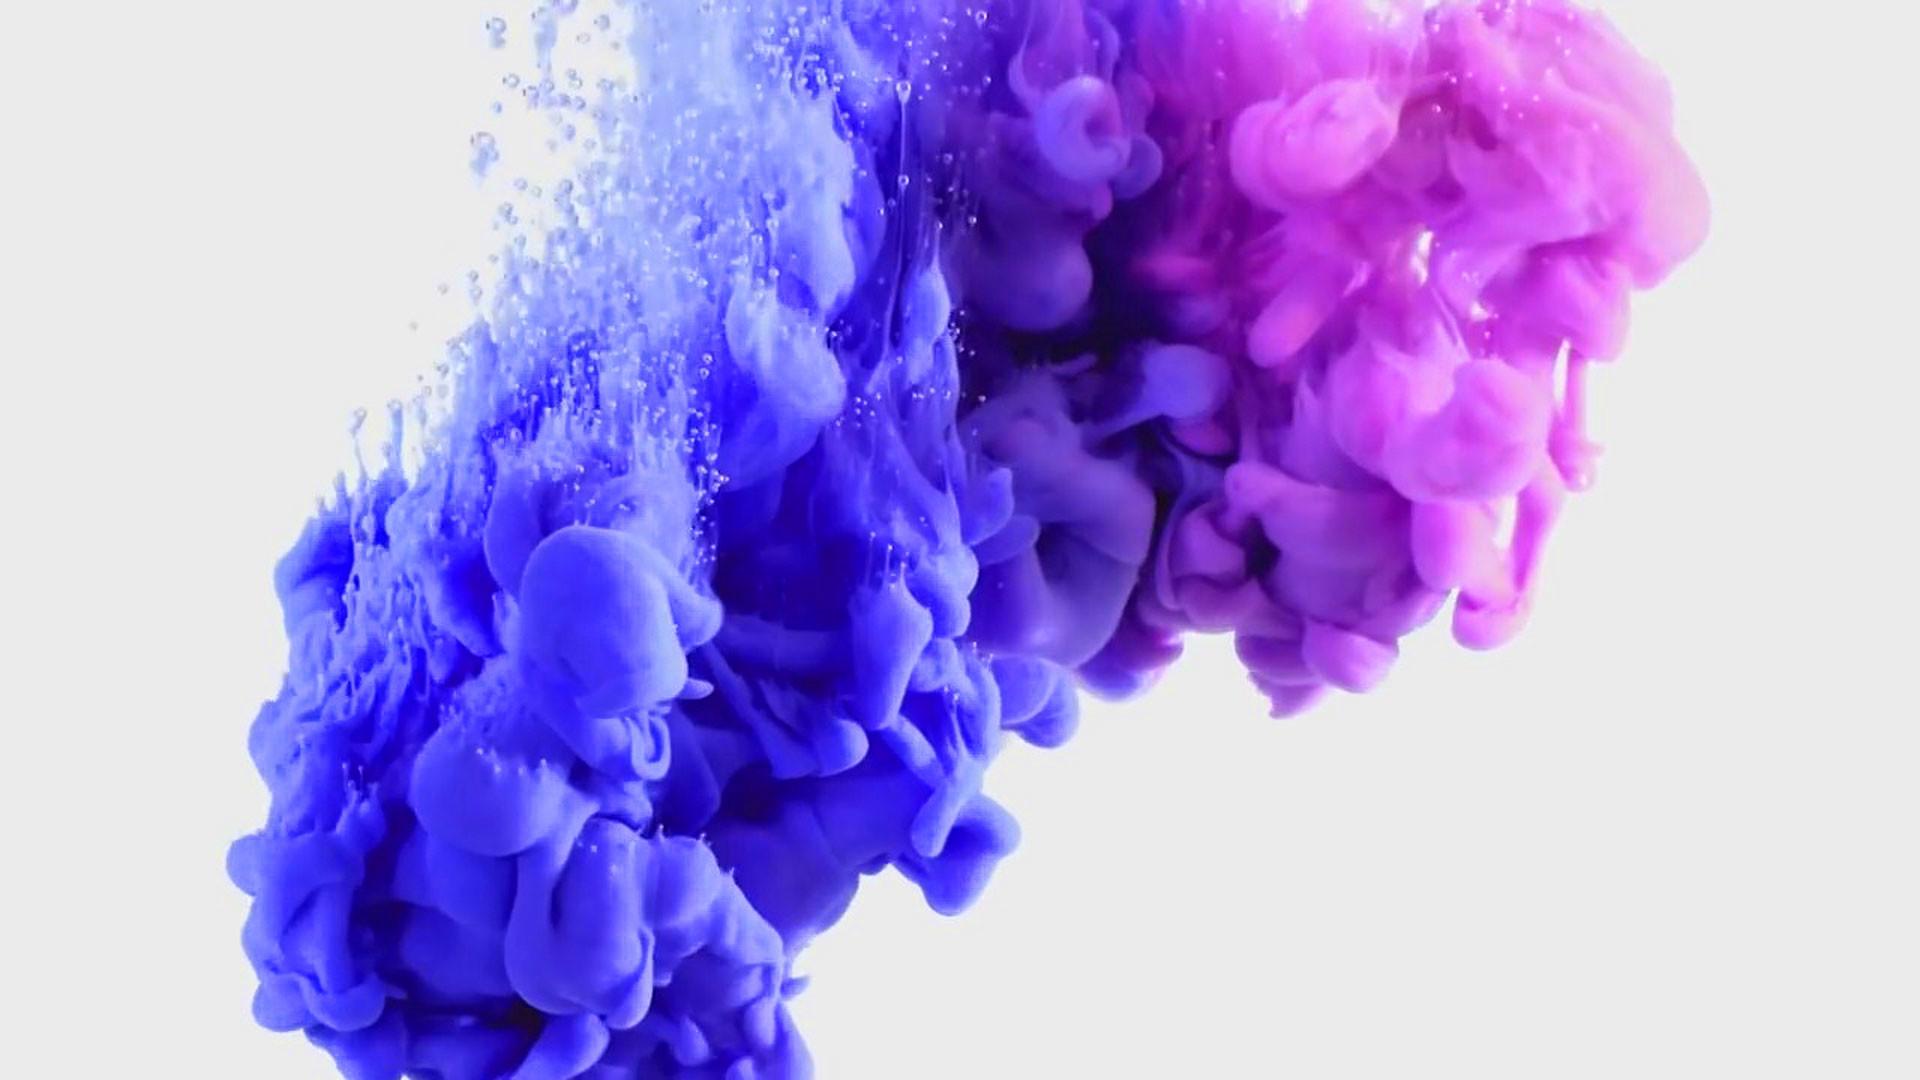 Hd Pics Photos Stunning Attractive Color Explosion - Explosion De Colores Png - HD Wallpaper